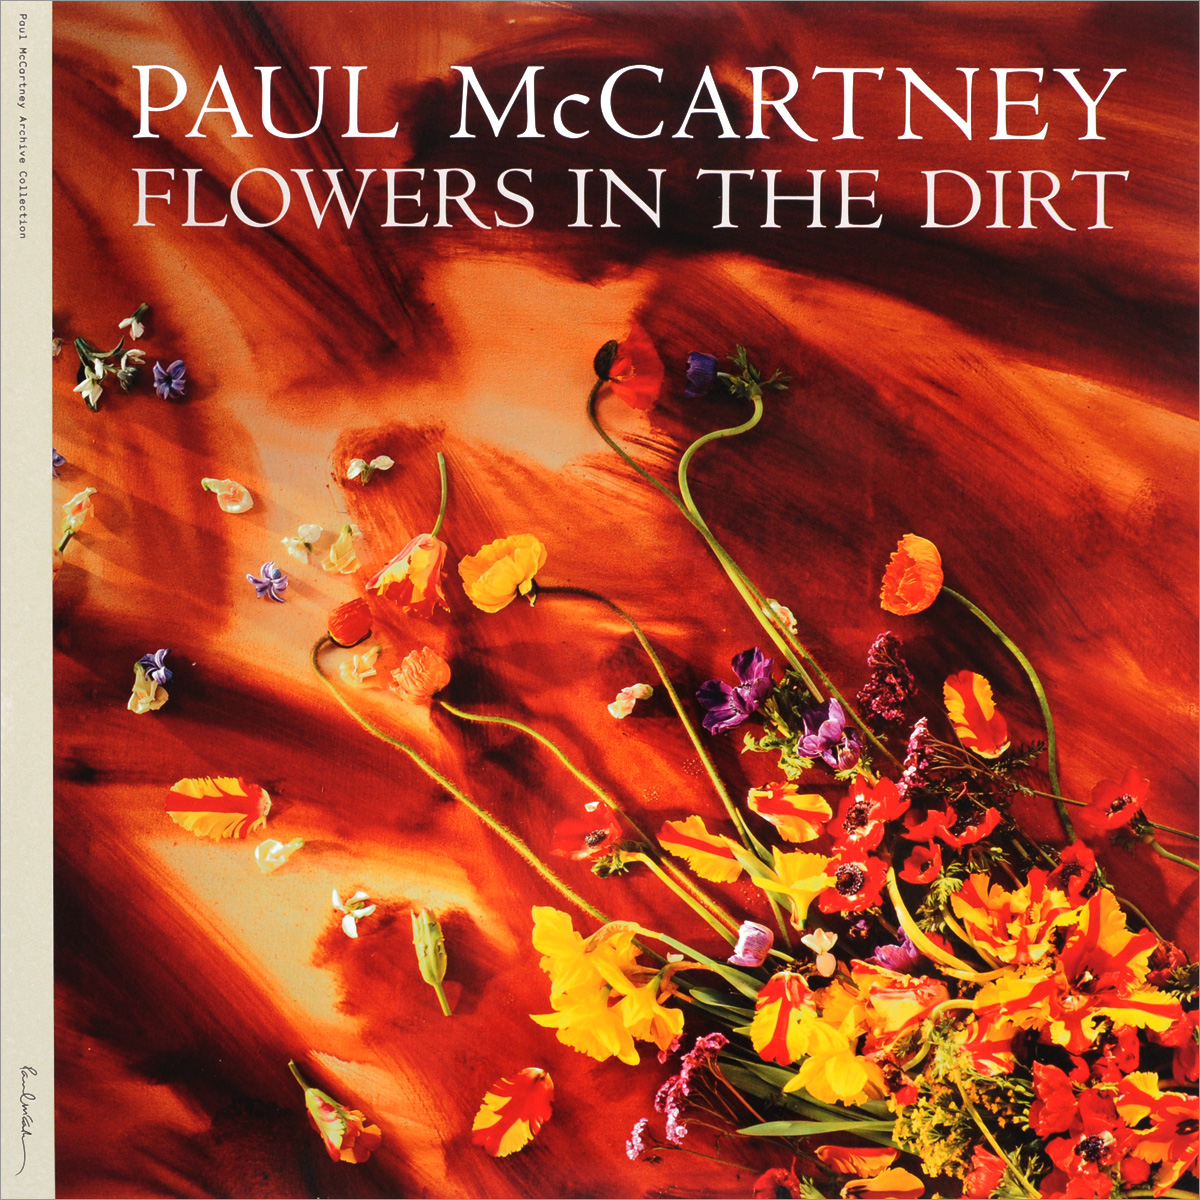 Пол Маккартни Paul McCartney. Flowers In The Dirt (2 LP) пол маккартни paul mccartney flowers in the dirt special edition 2 cd